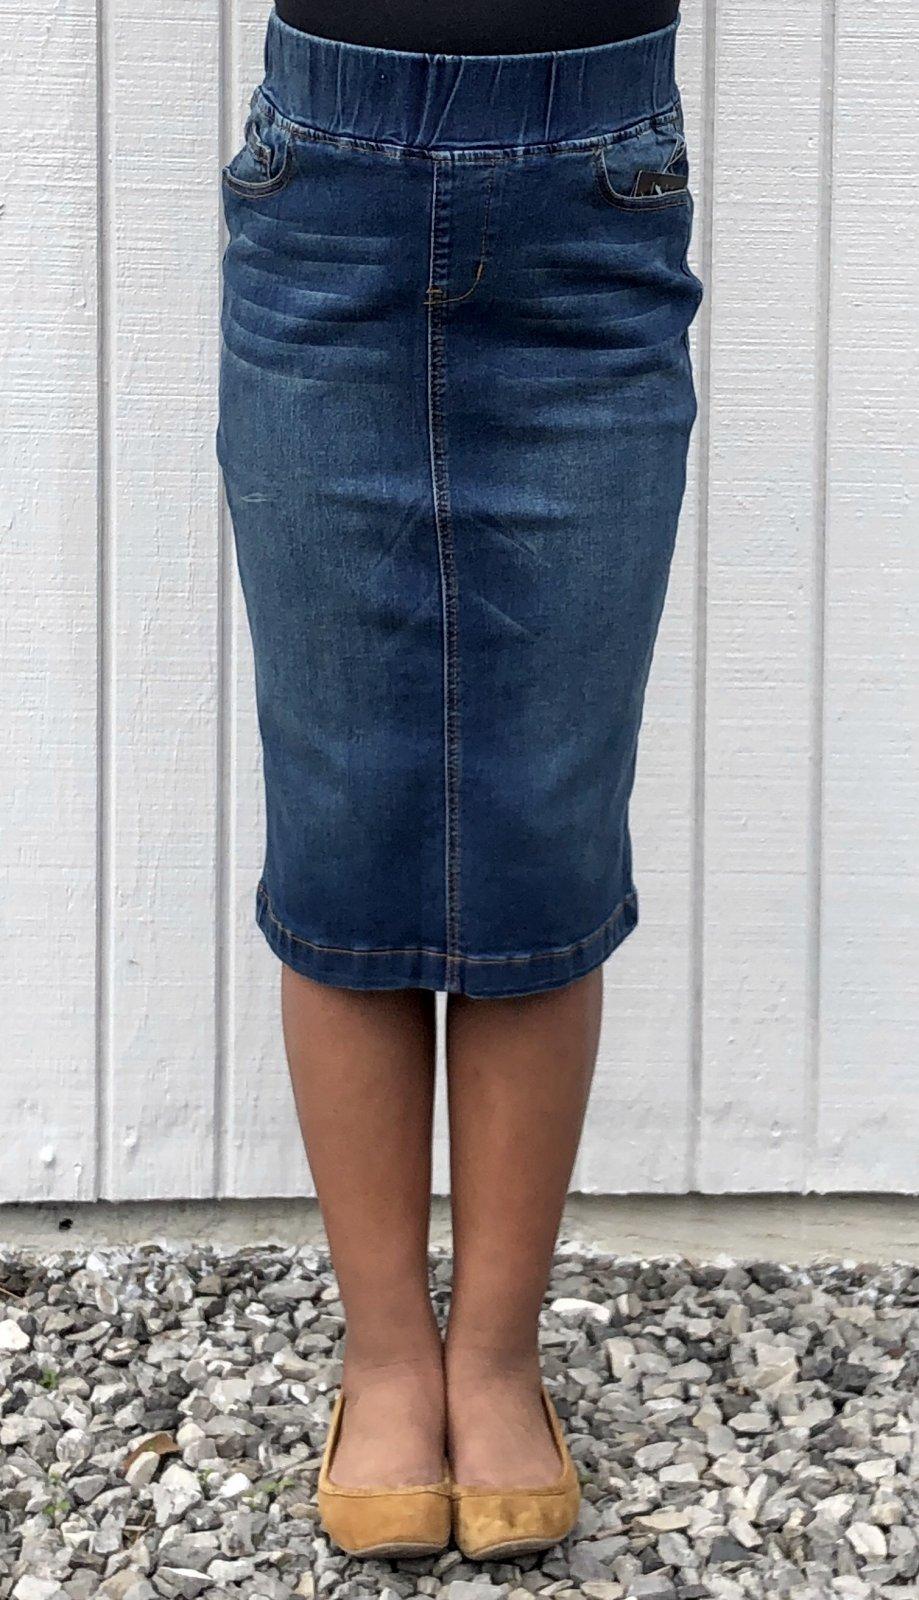 Vintage Elastic Denim Skirt